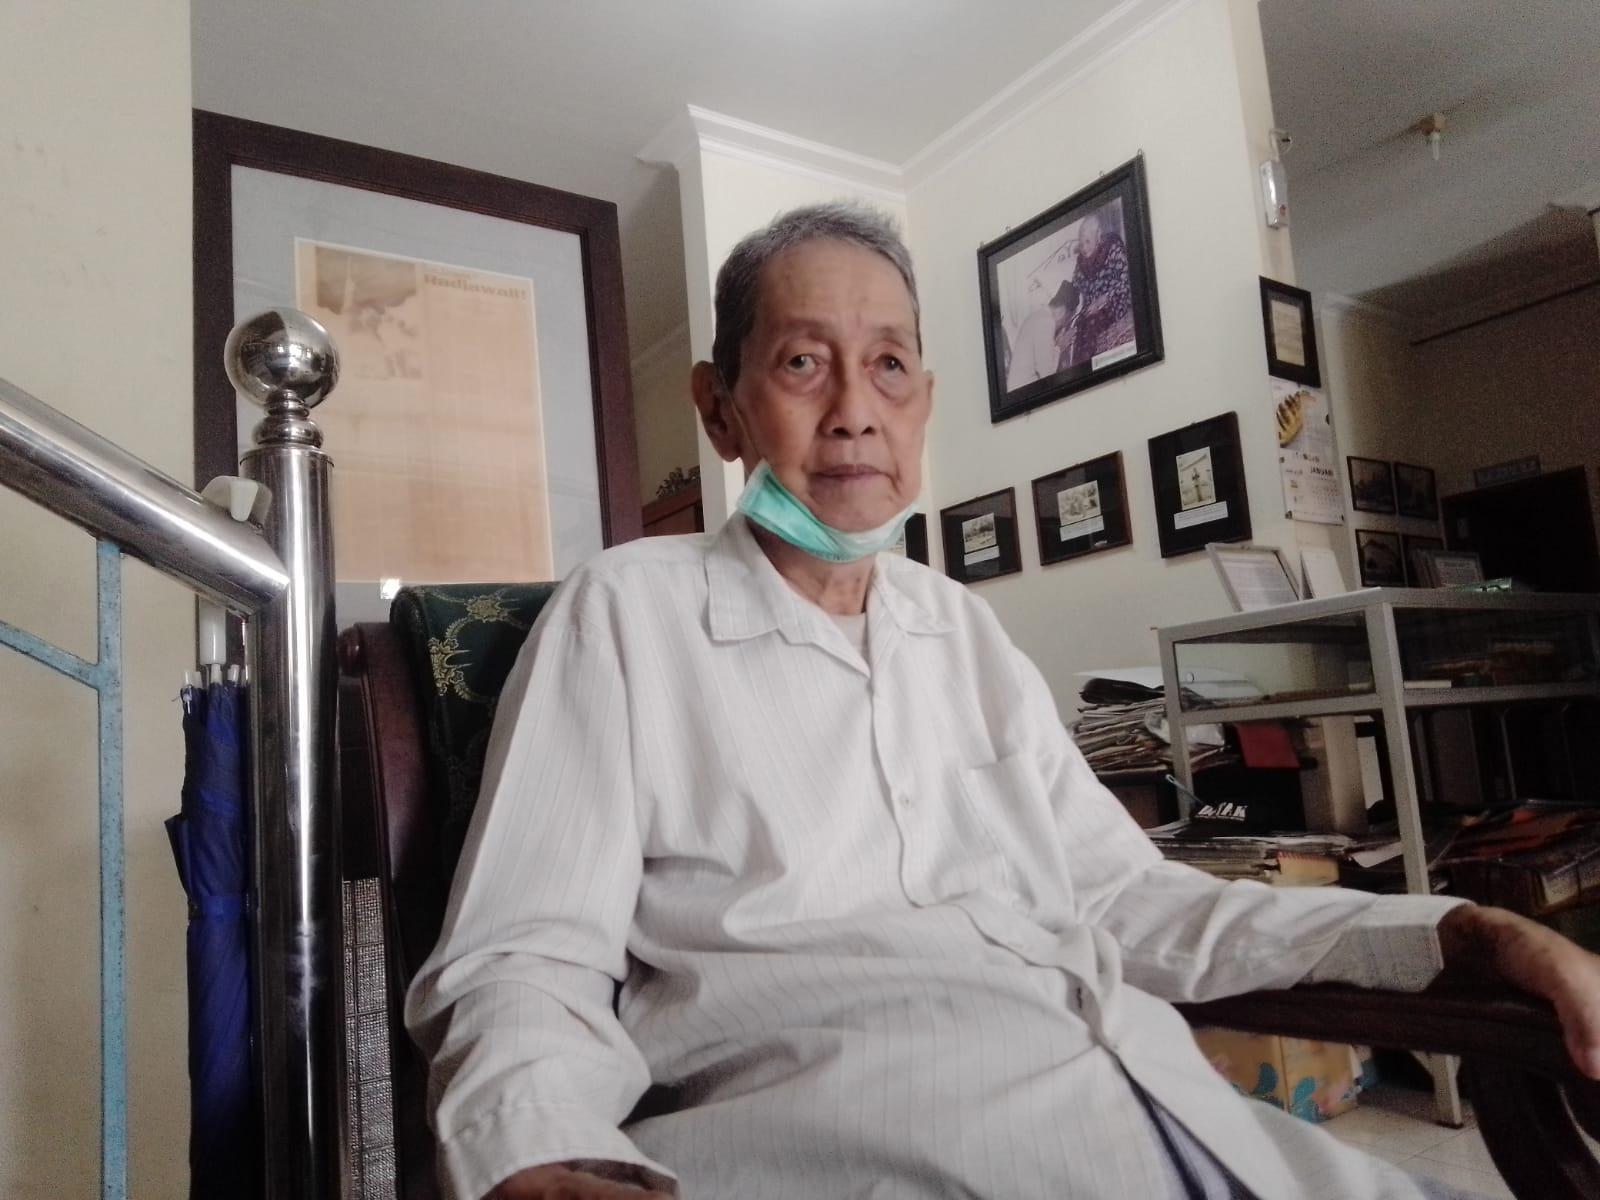 Oei Him Hwie, pendiri Perpustakaan Agung Surabaya. (Foto: Rangga Aji/Tugu Jatim)